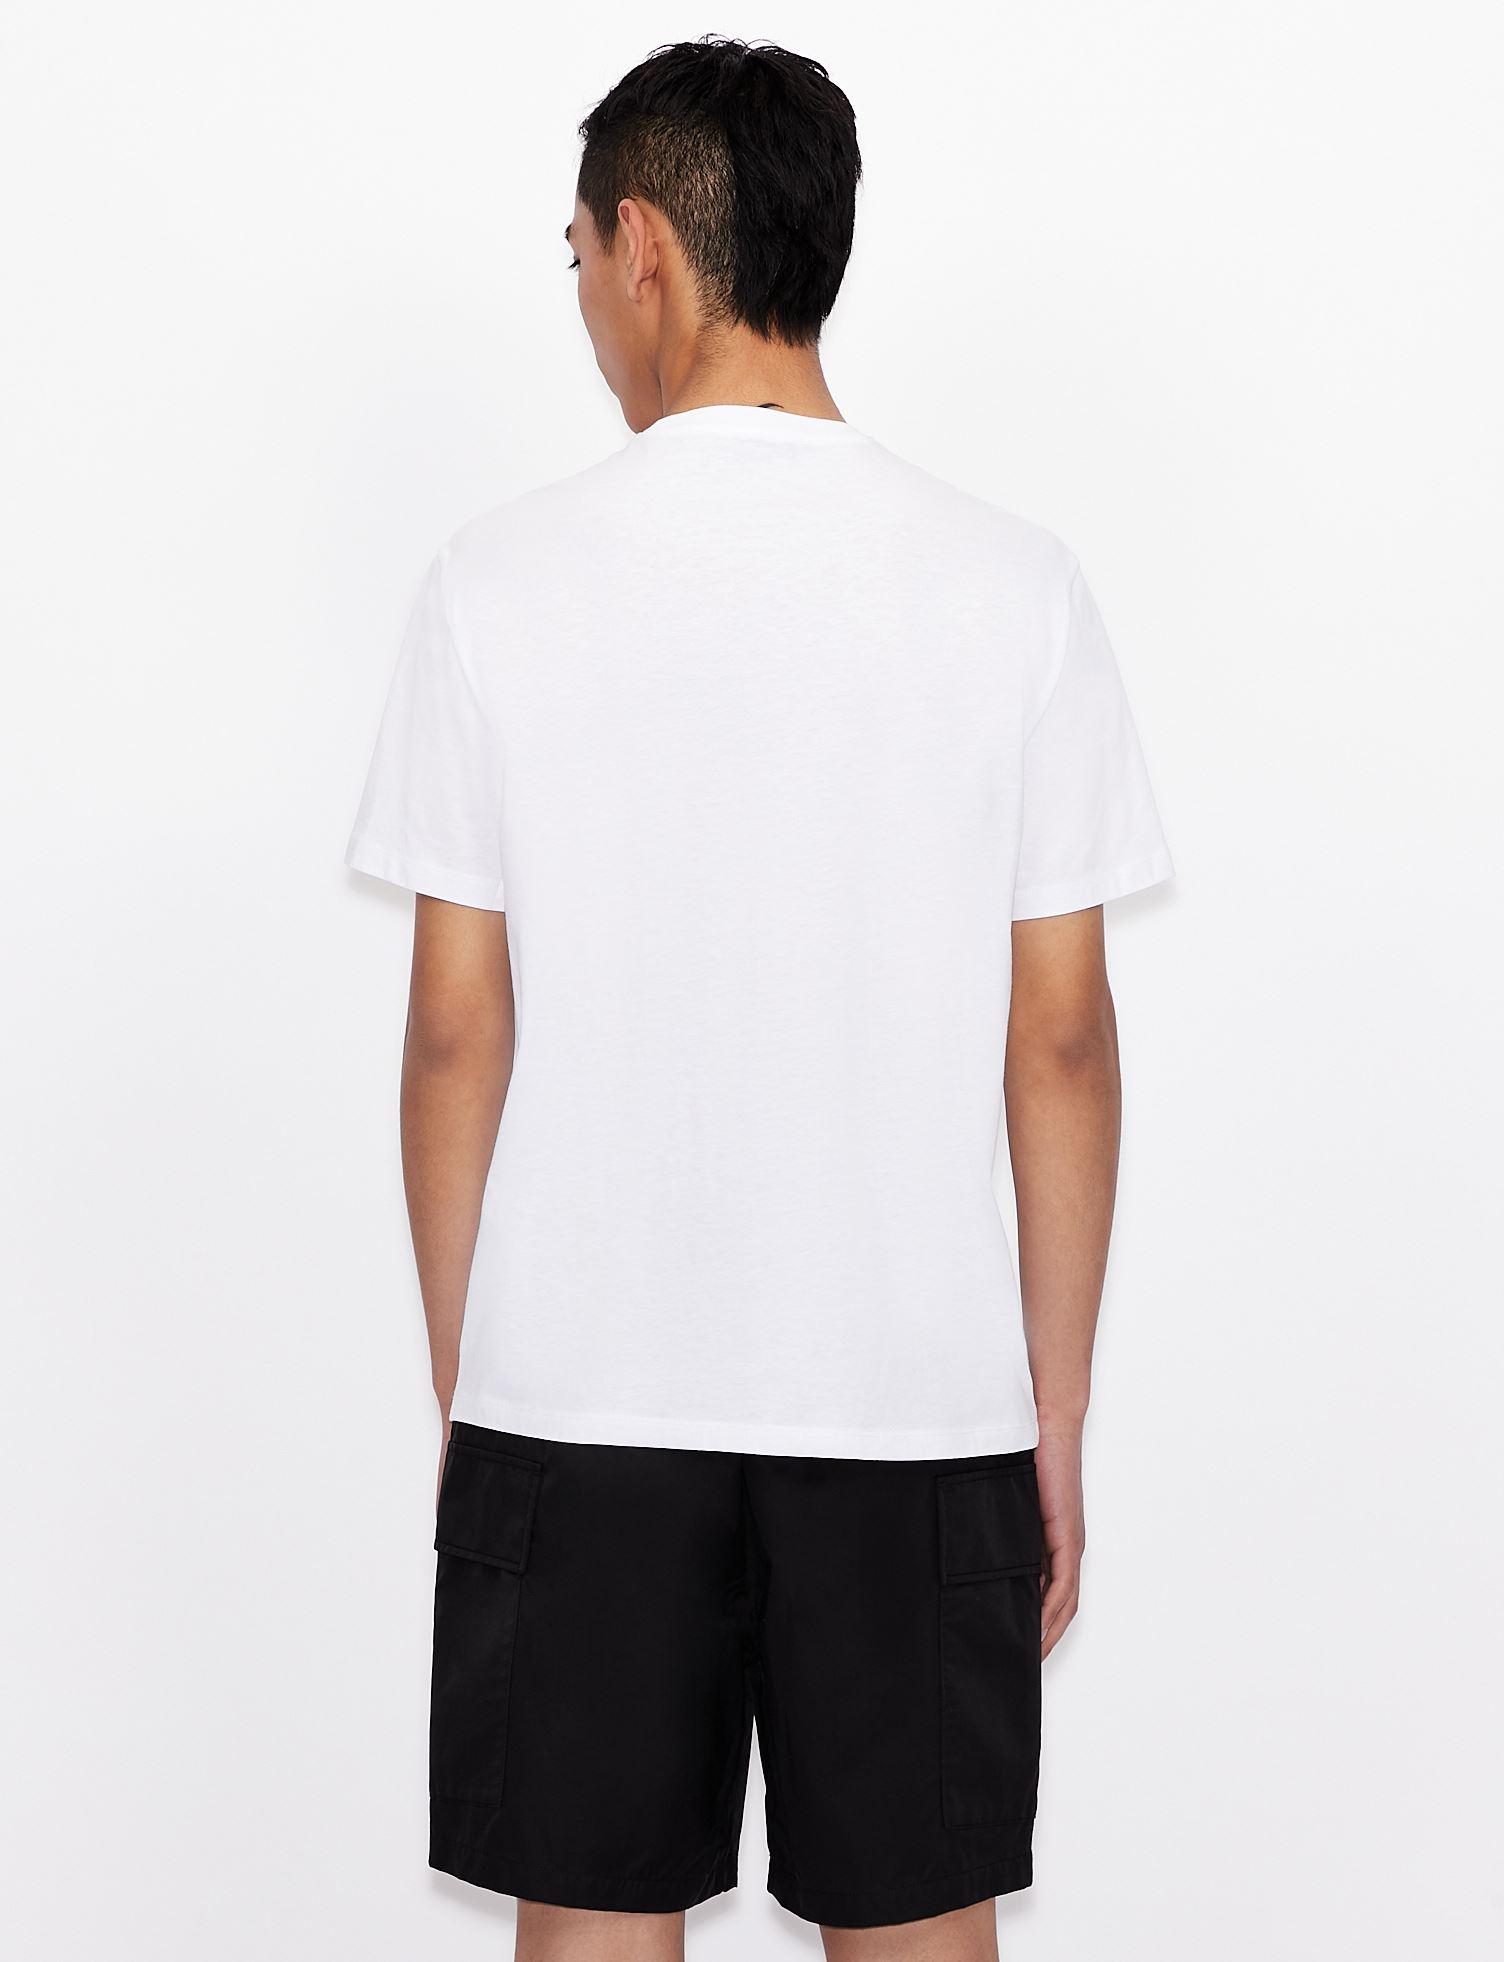 T-shirt Armani Exchange regular fit ARMANI EXCHANGE   T-shirt   3KZTFU-ZJH4Z1100